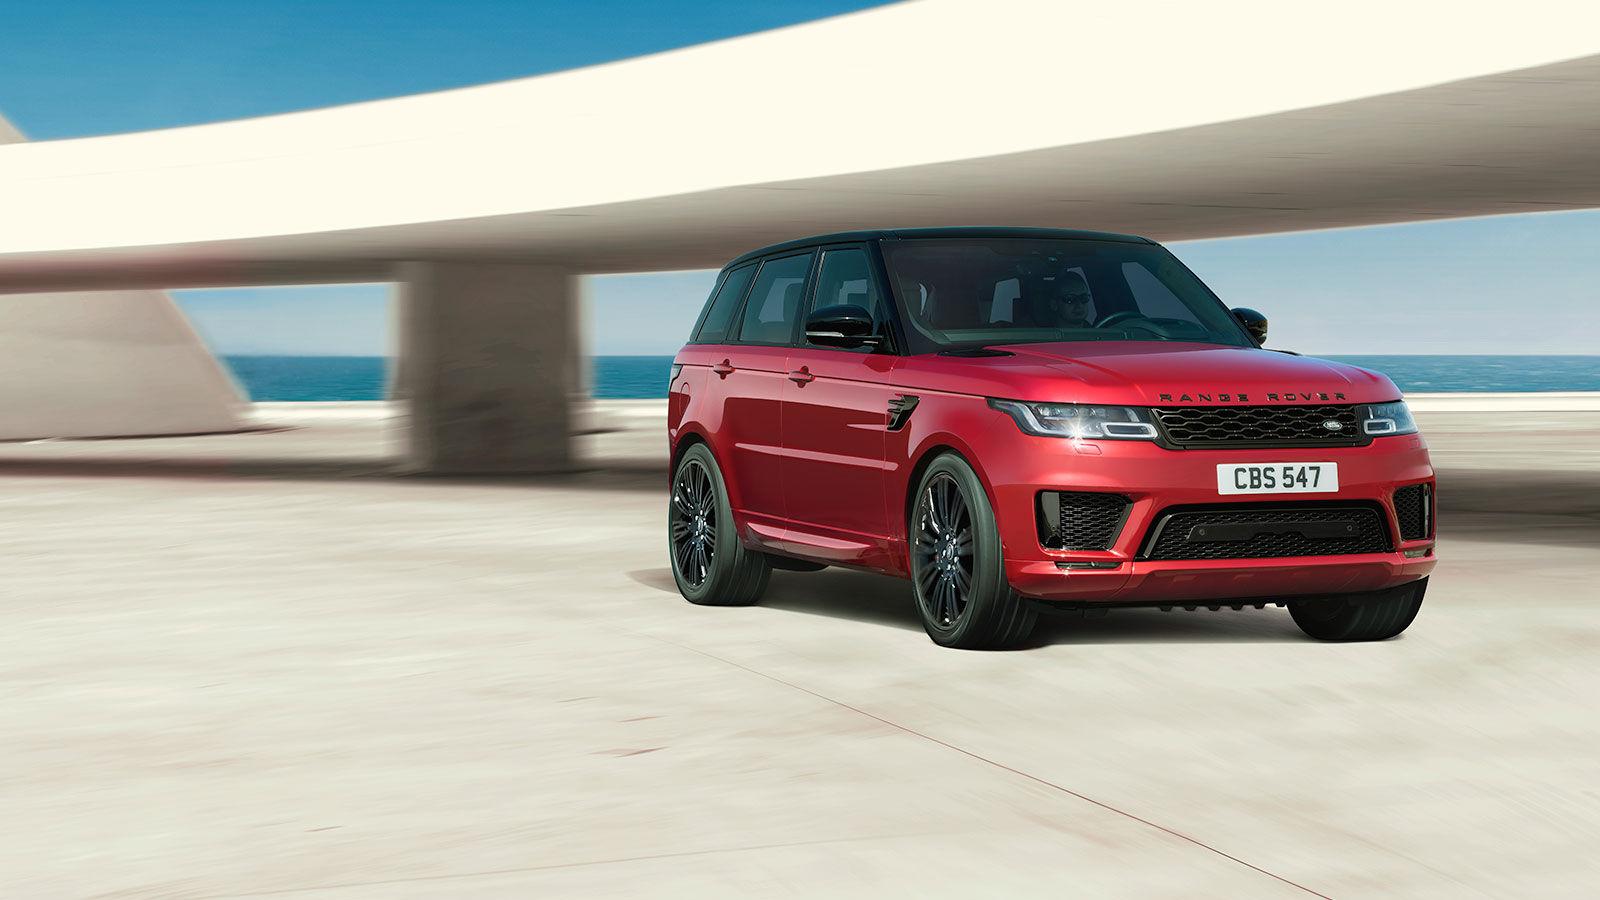 Land Rover Luxury Sedan Sports 4x4 Cars Land Rover Zimbabwe